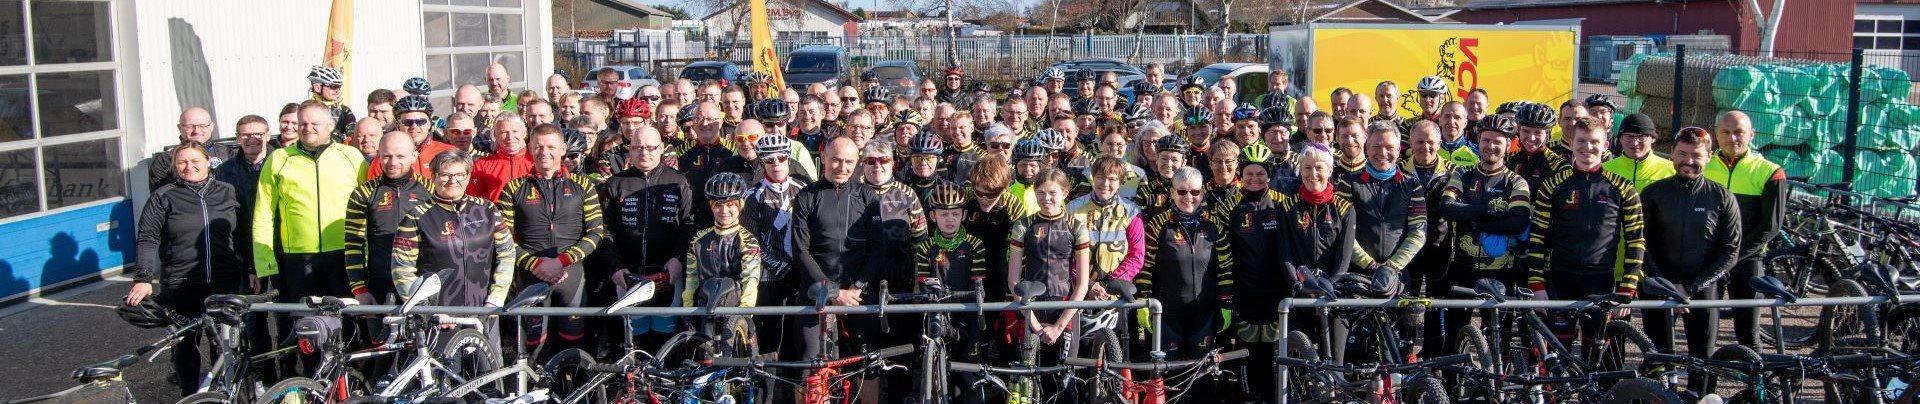 Varde Cykelklub